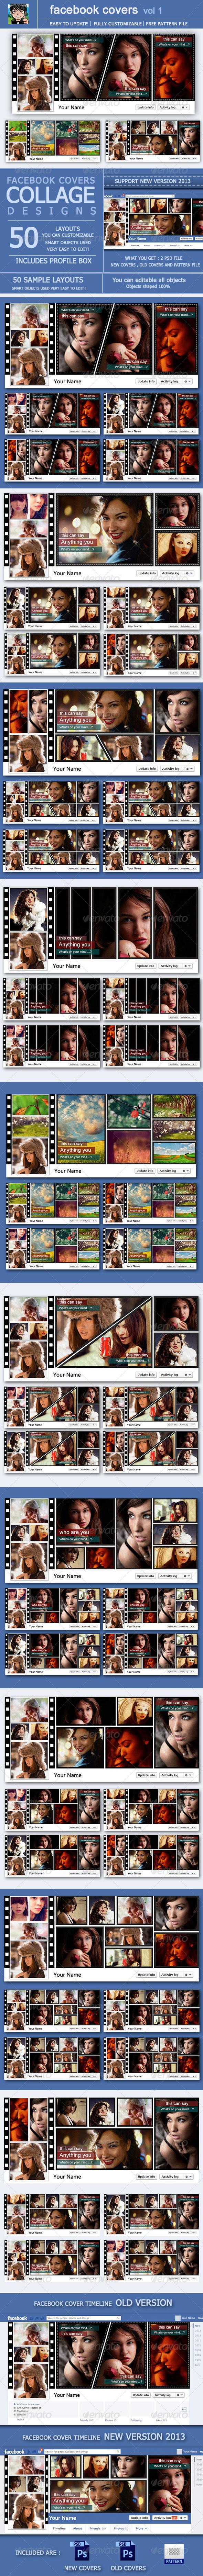 Facebook Covers : Vol 1  - Facebook Timeline Covers Social Media